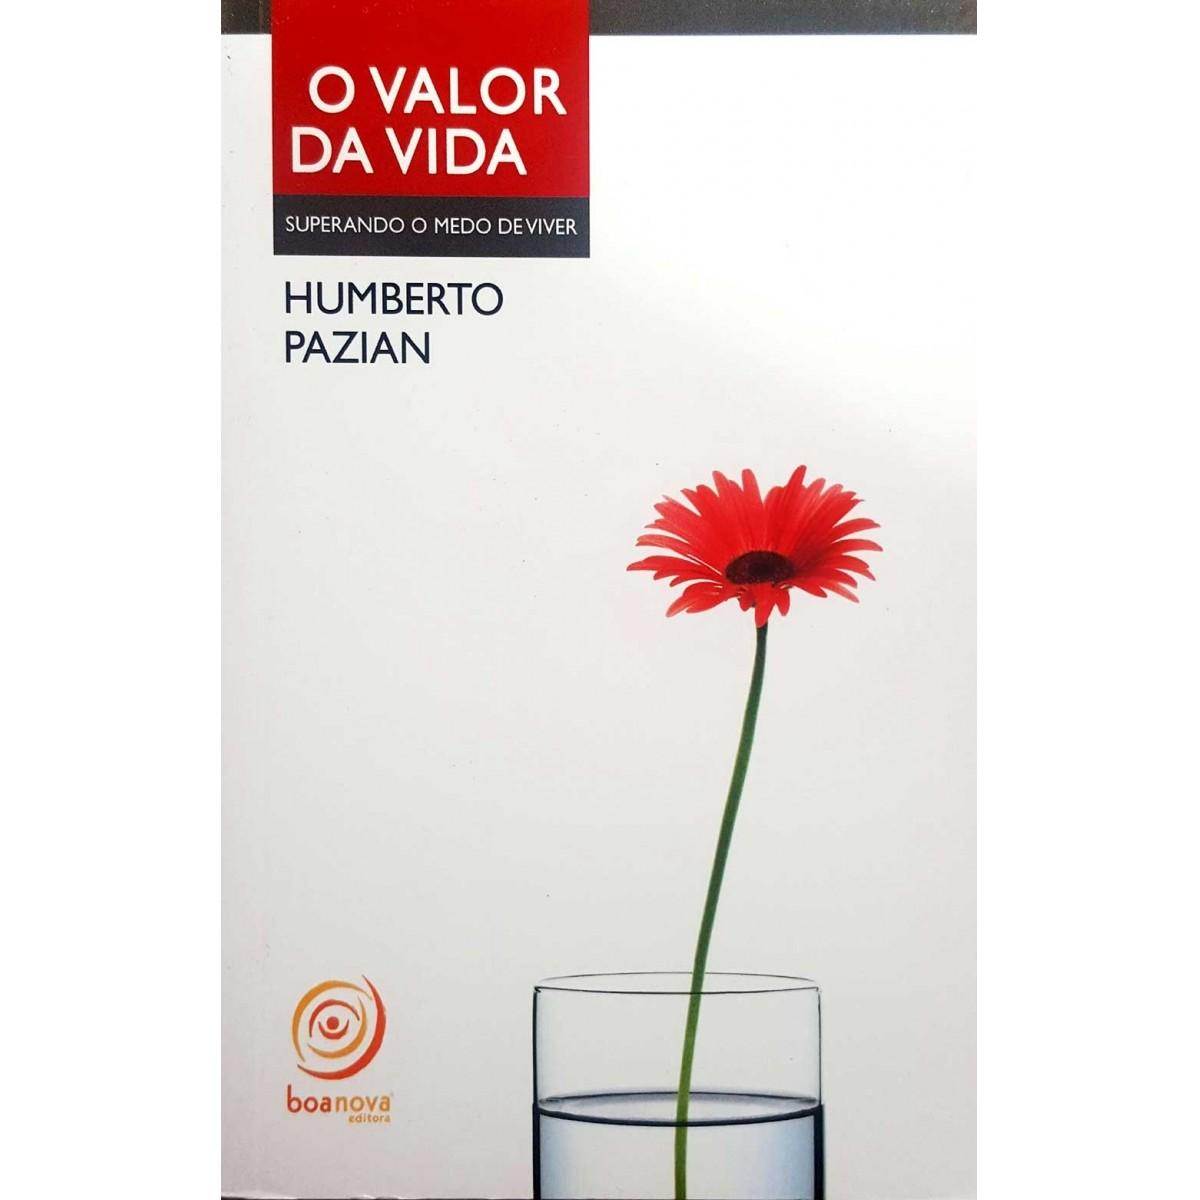 Livro - Humberto Pazian - O Valor da Vida